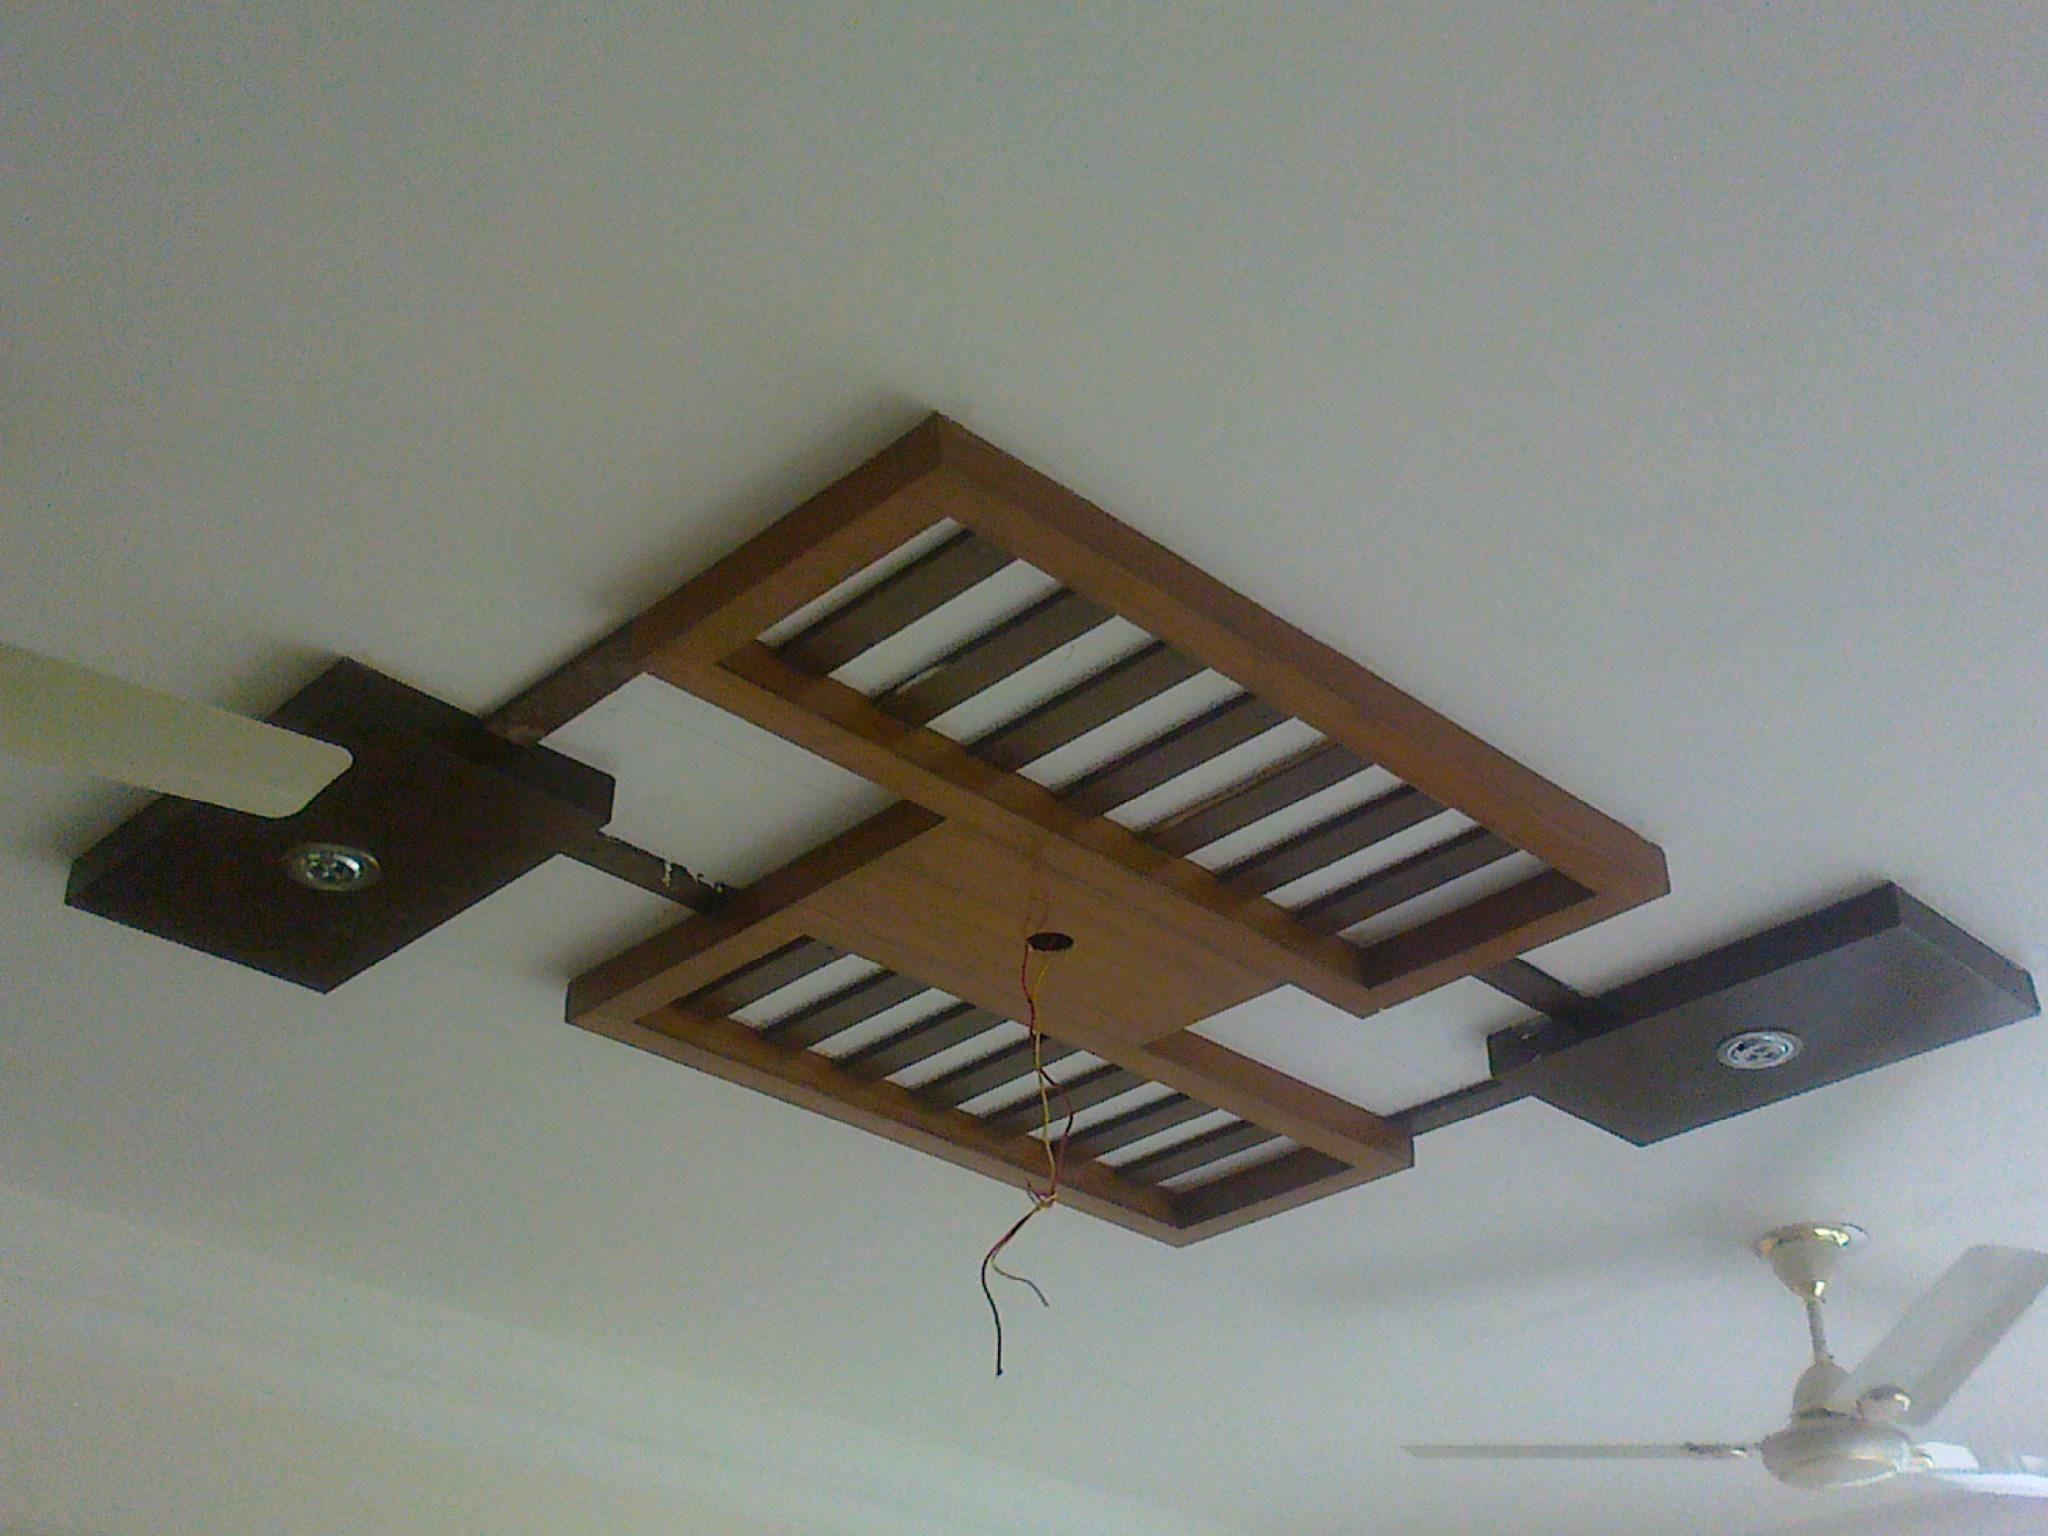 Wood Ceiling Designs Living Room Wooden False Ceiling For Drawi Gharexpert Wooden False Ceiling For